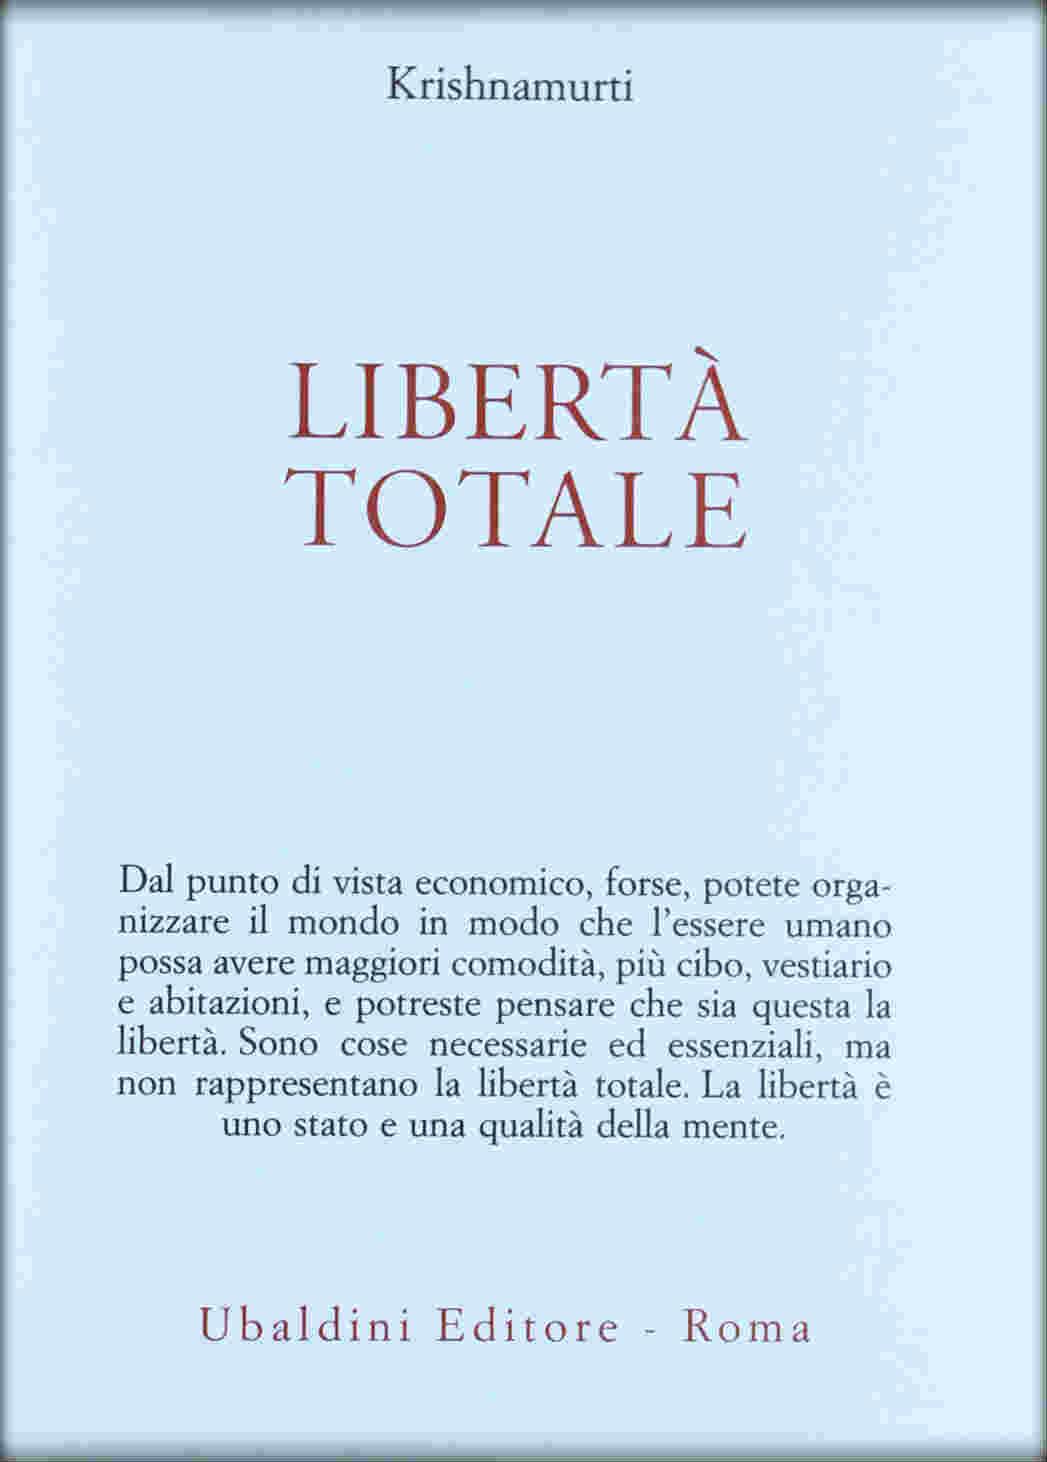 Libertà totale (J. Krishnamurti)